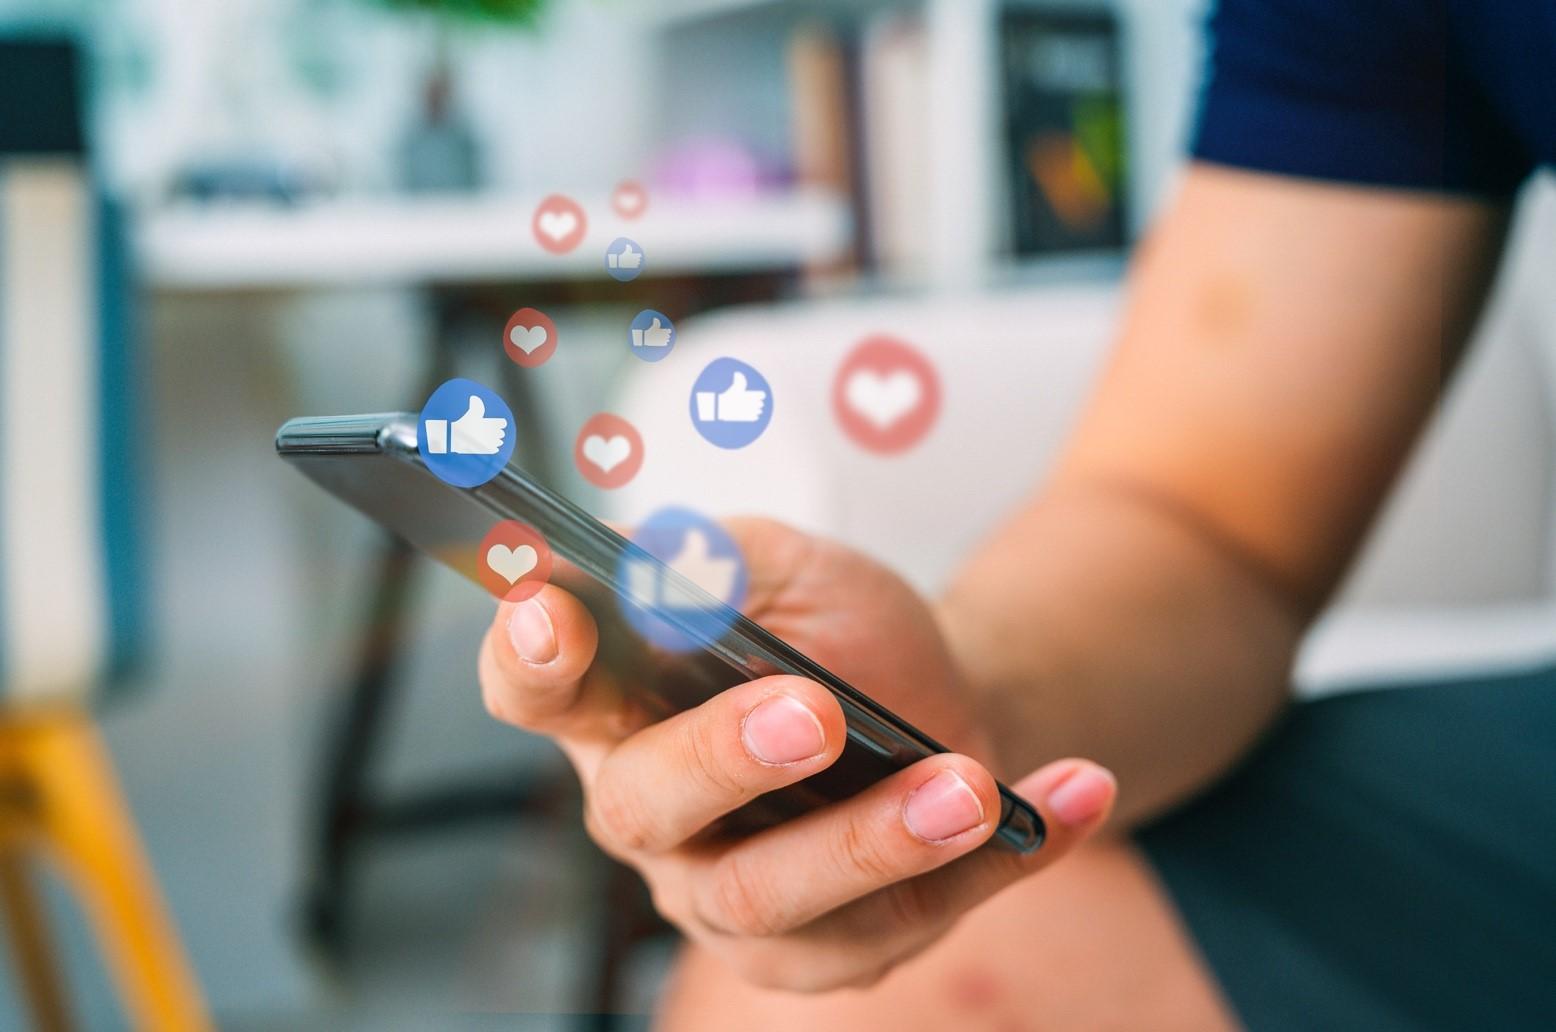 Socialmediakanalen inrichten